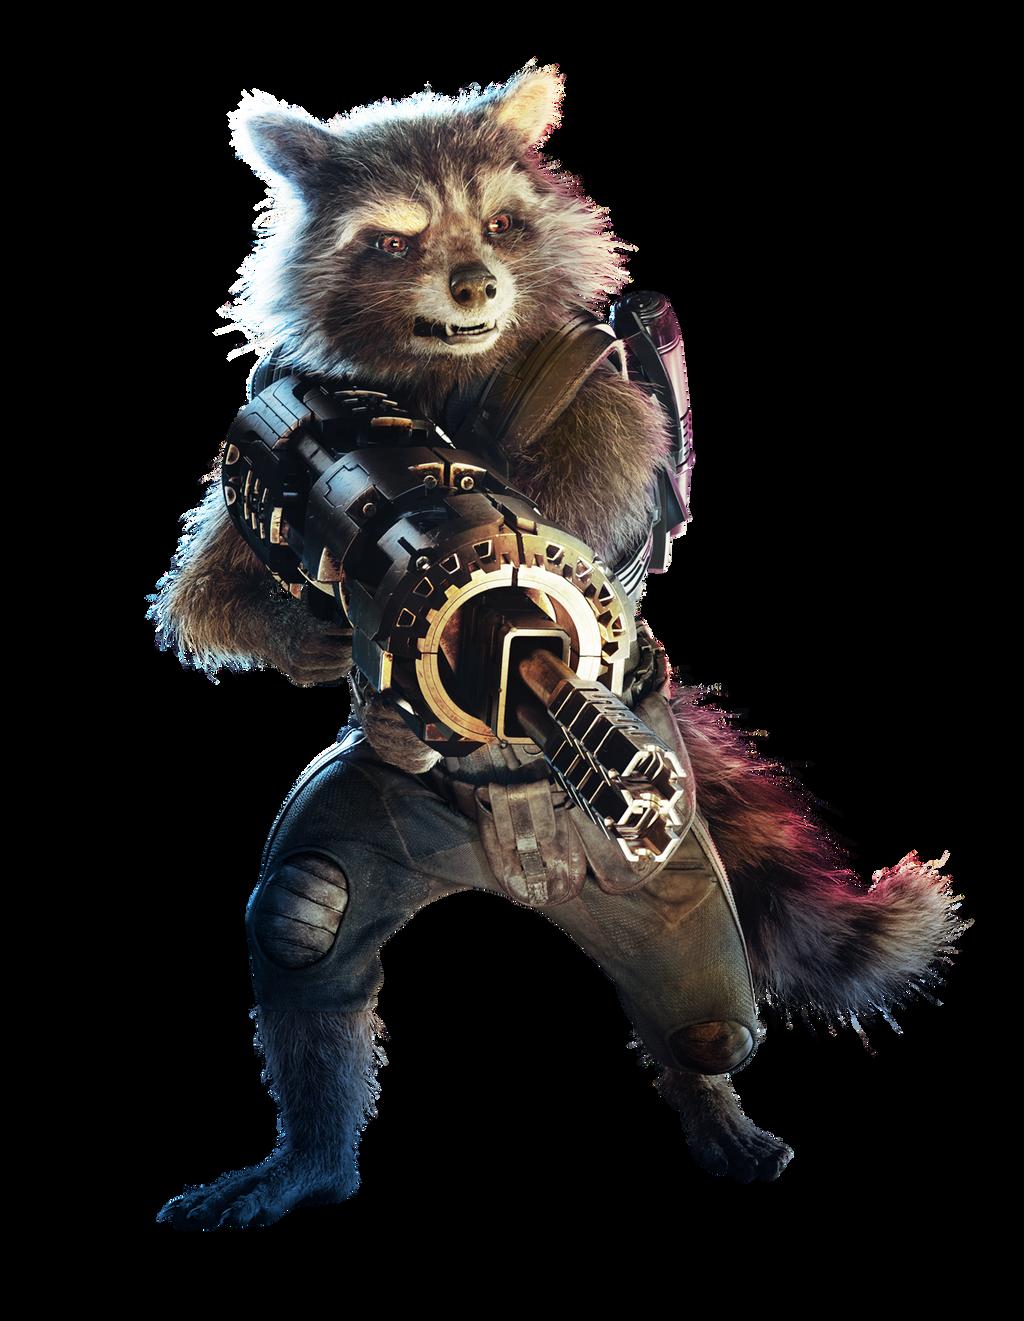 Star Lord And Rocket Raccoon By Timothygreenii On Deviantart: Rocket By Cptcommunist On DeviantArt